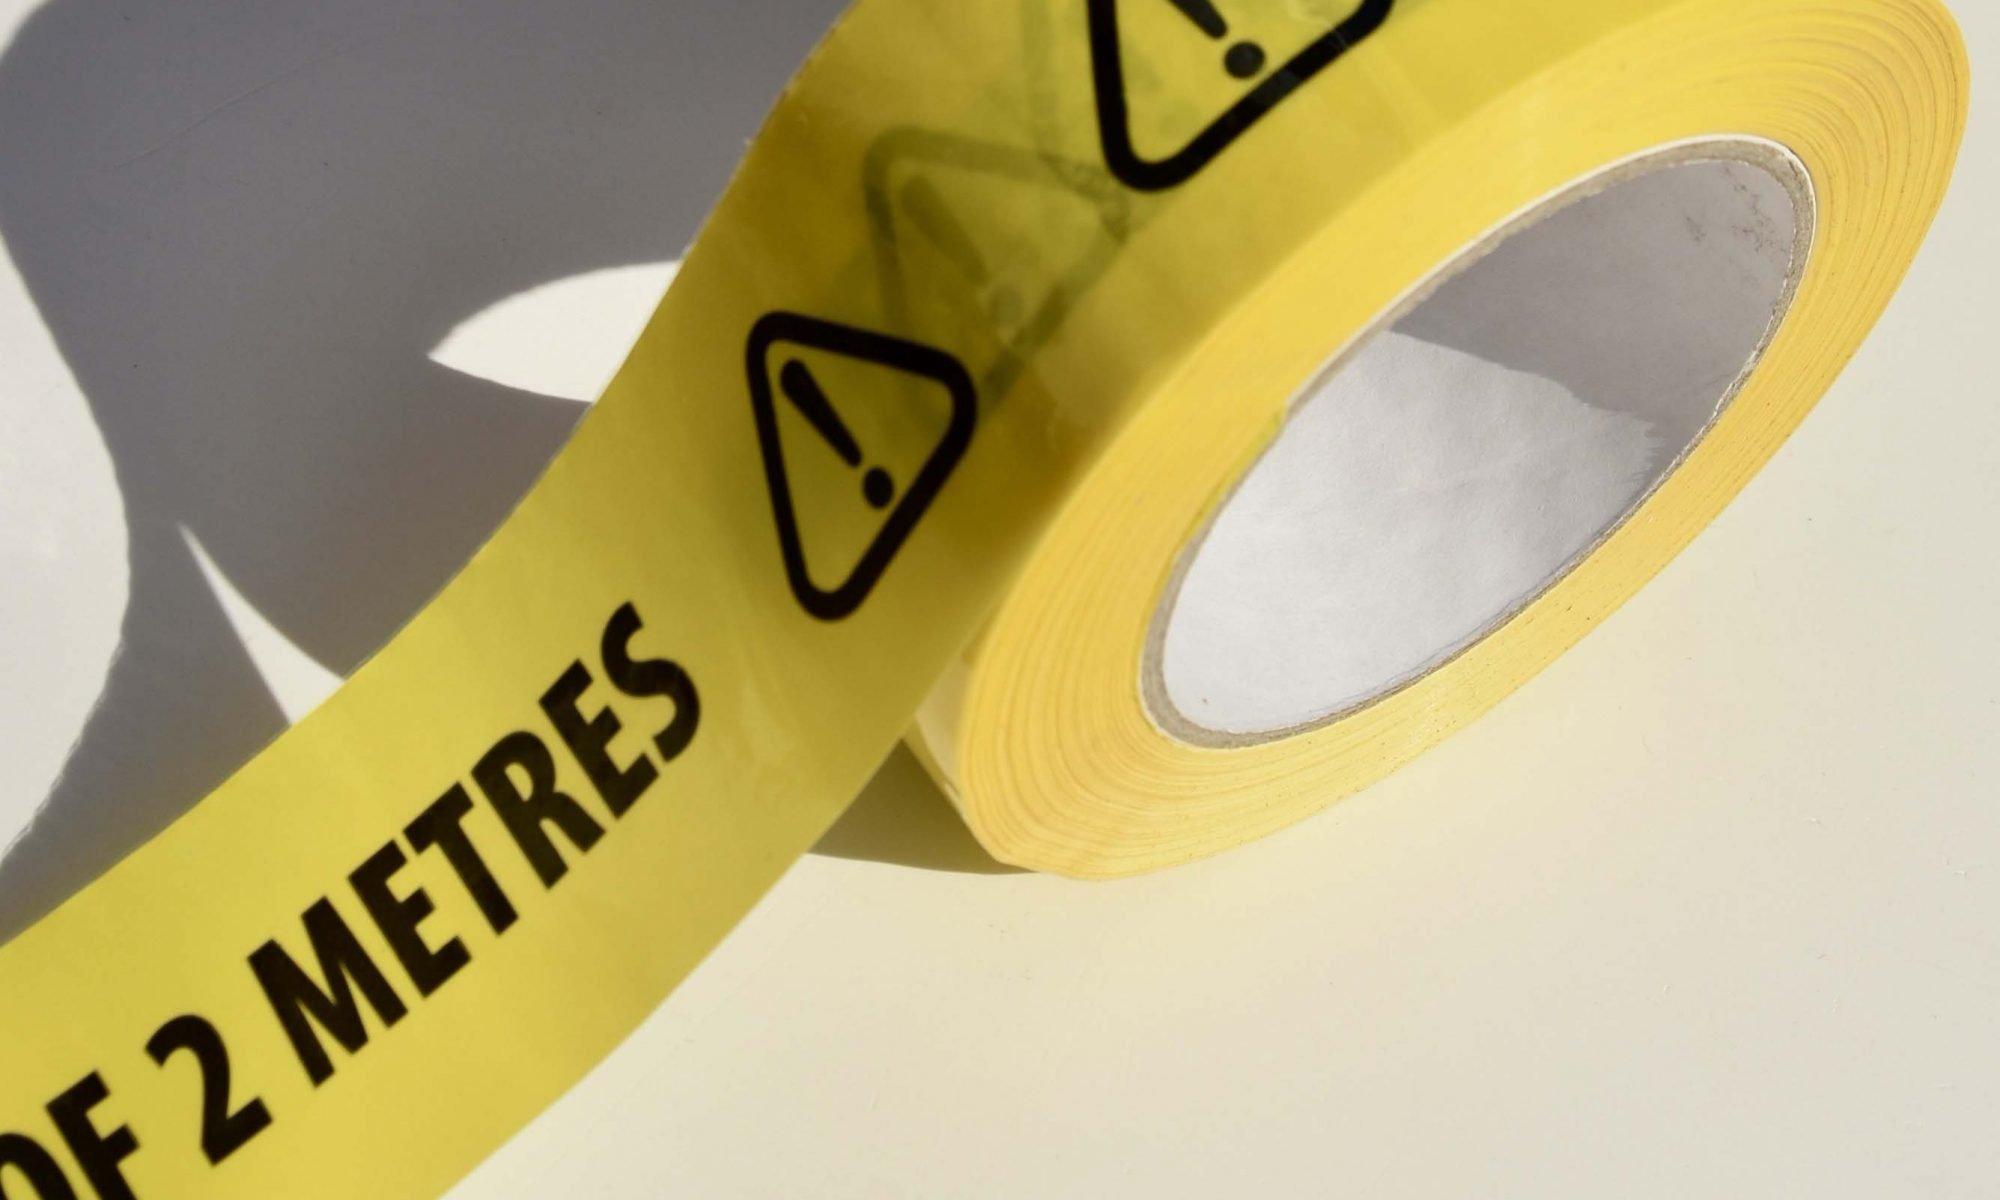 PLEASE KEEP A SAFE DISTANCE OF 2 METRES Black/Yellow Vinyl Floor Tape (50mm x 66m)